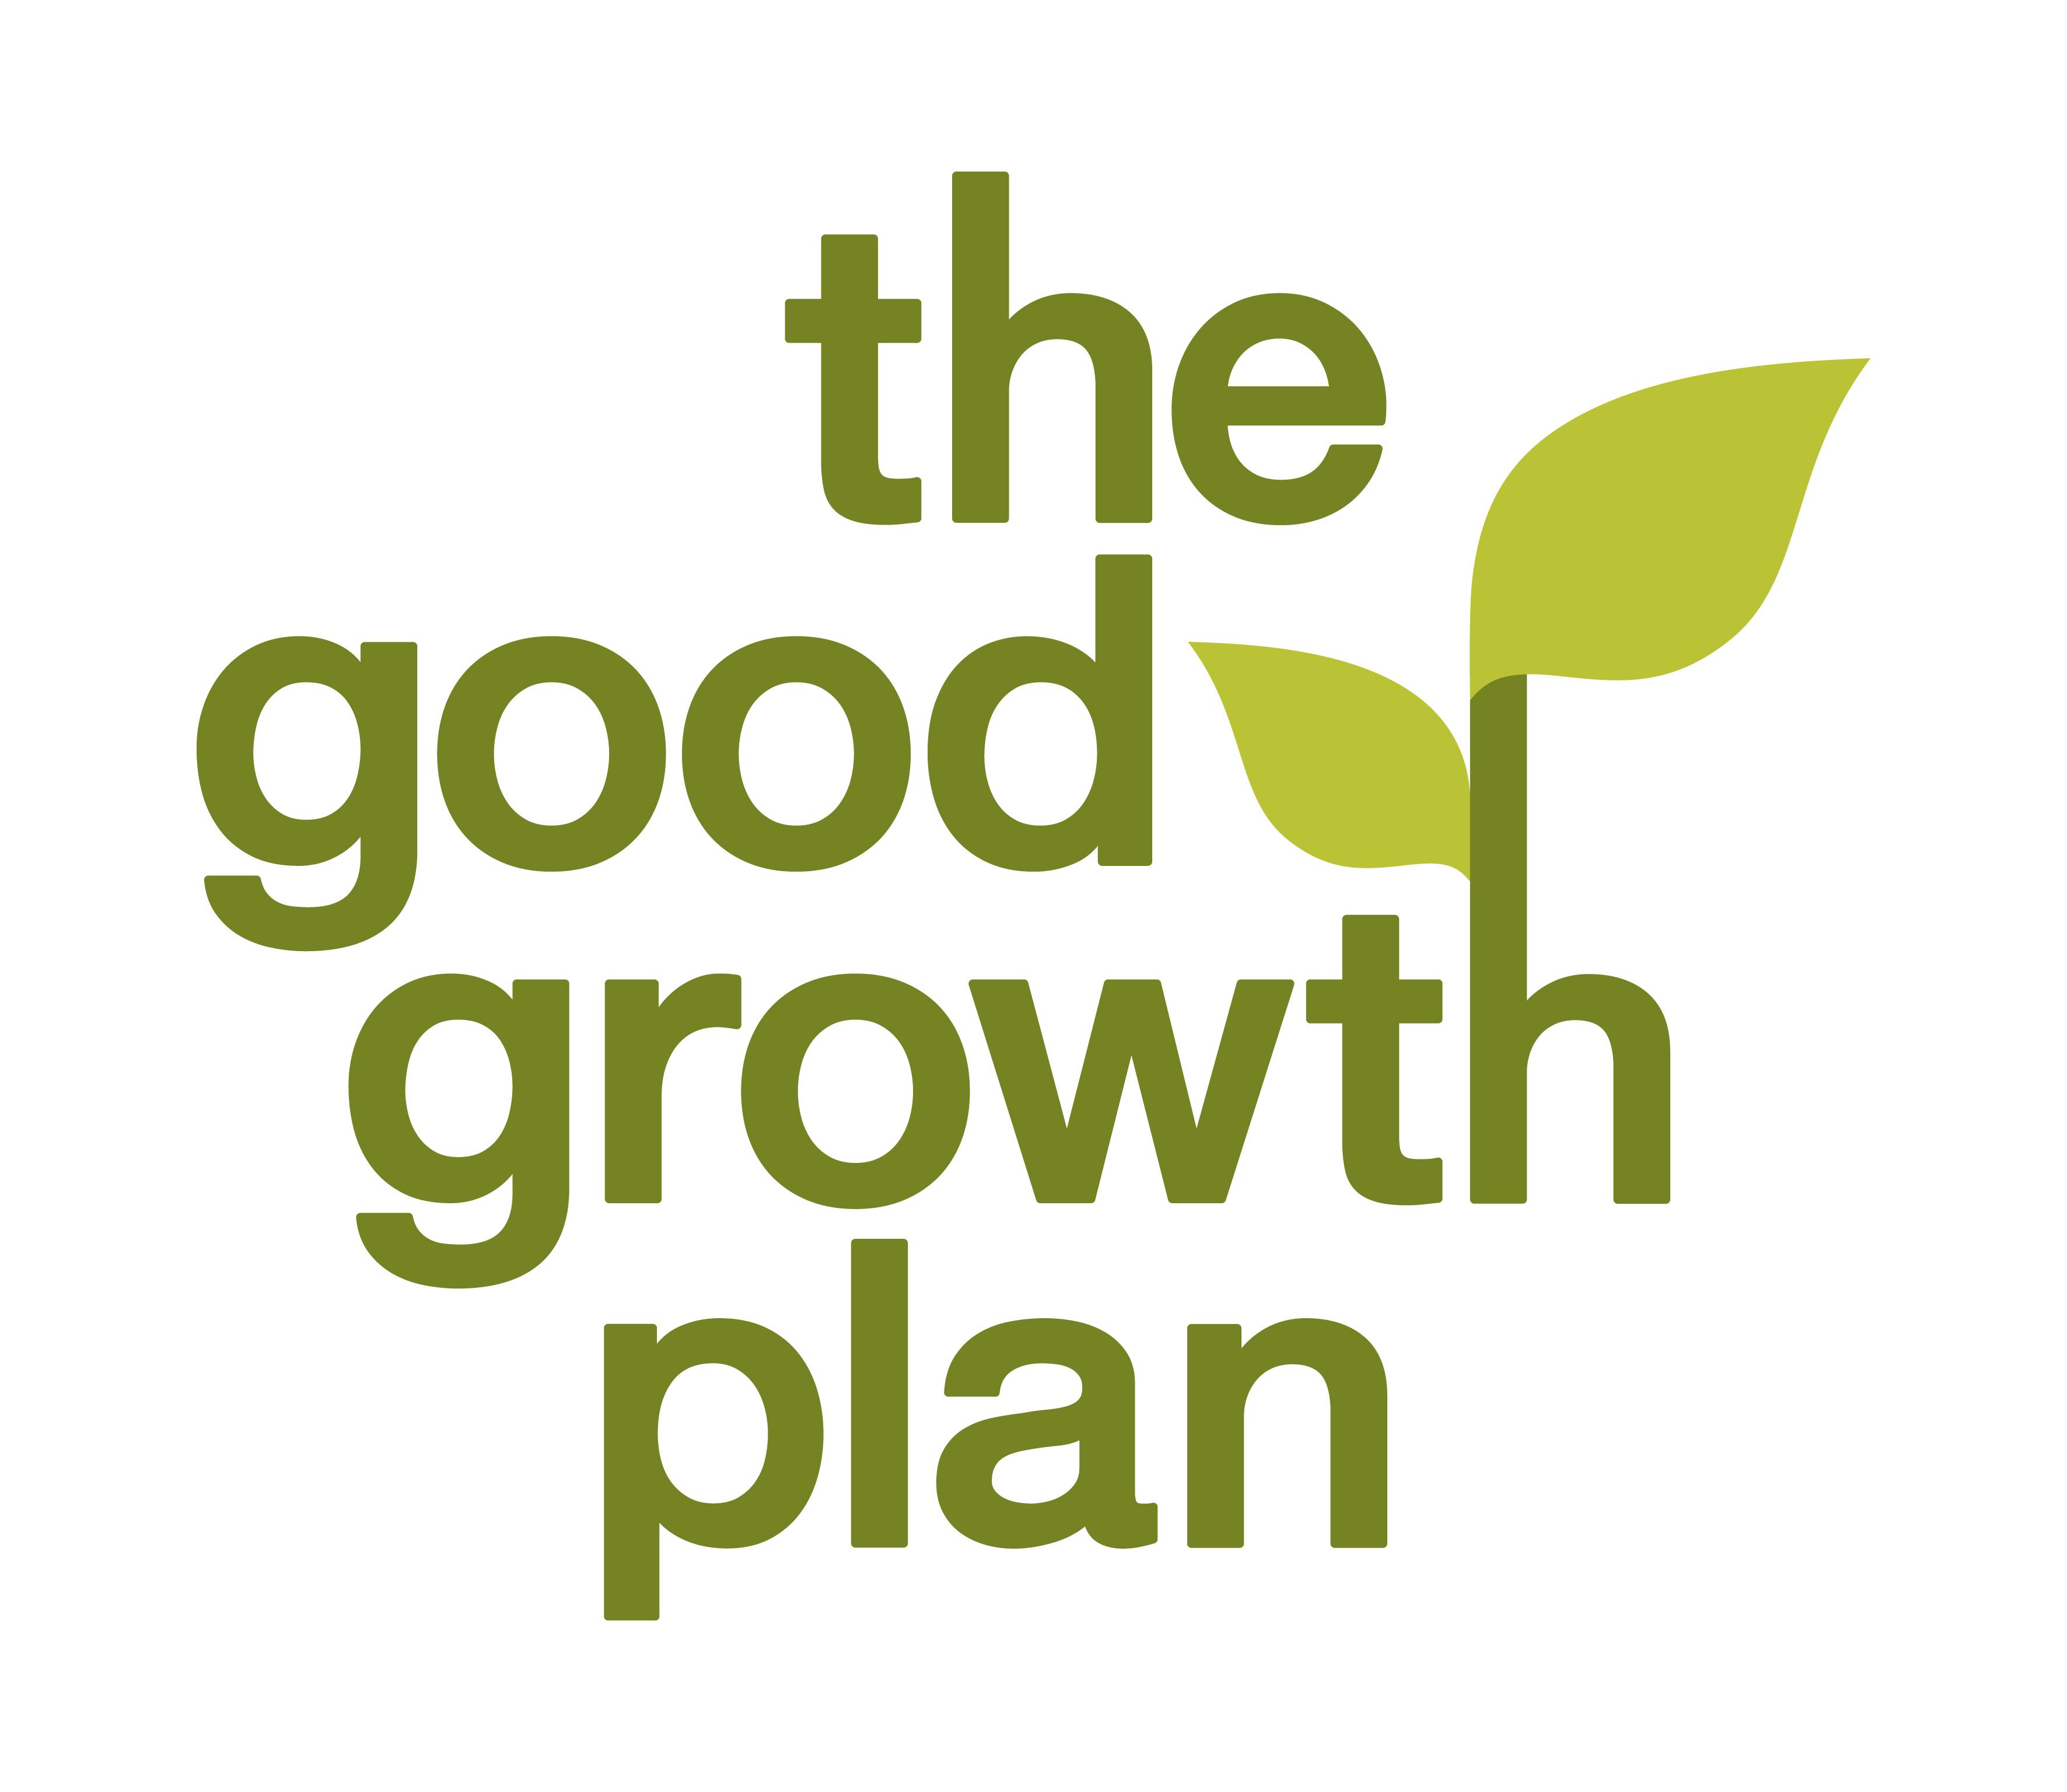 www.goodgrowthplan.com